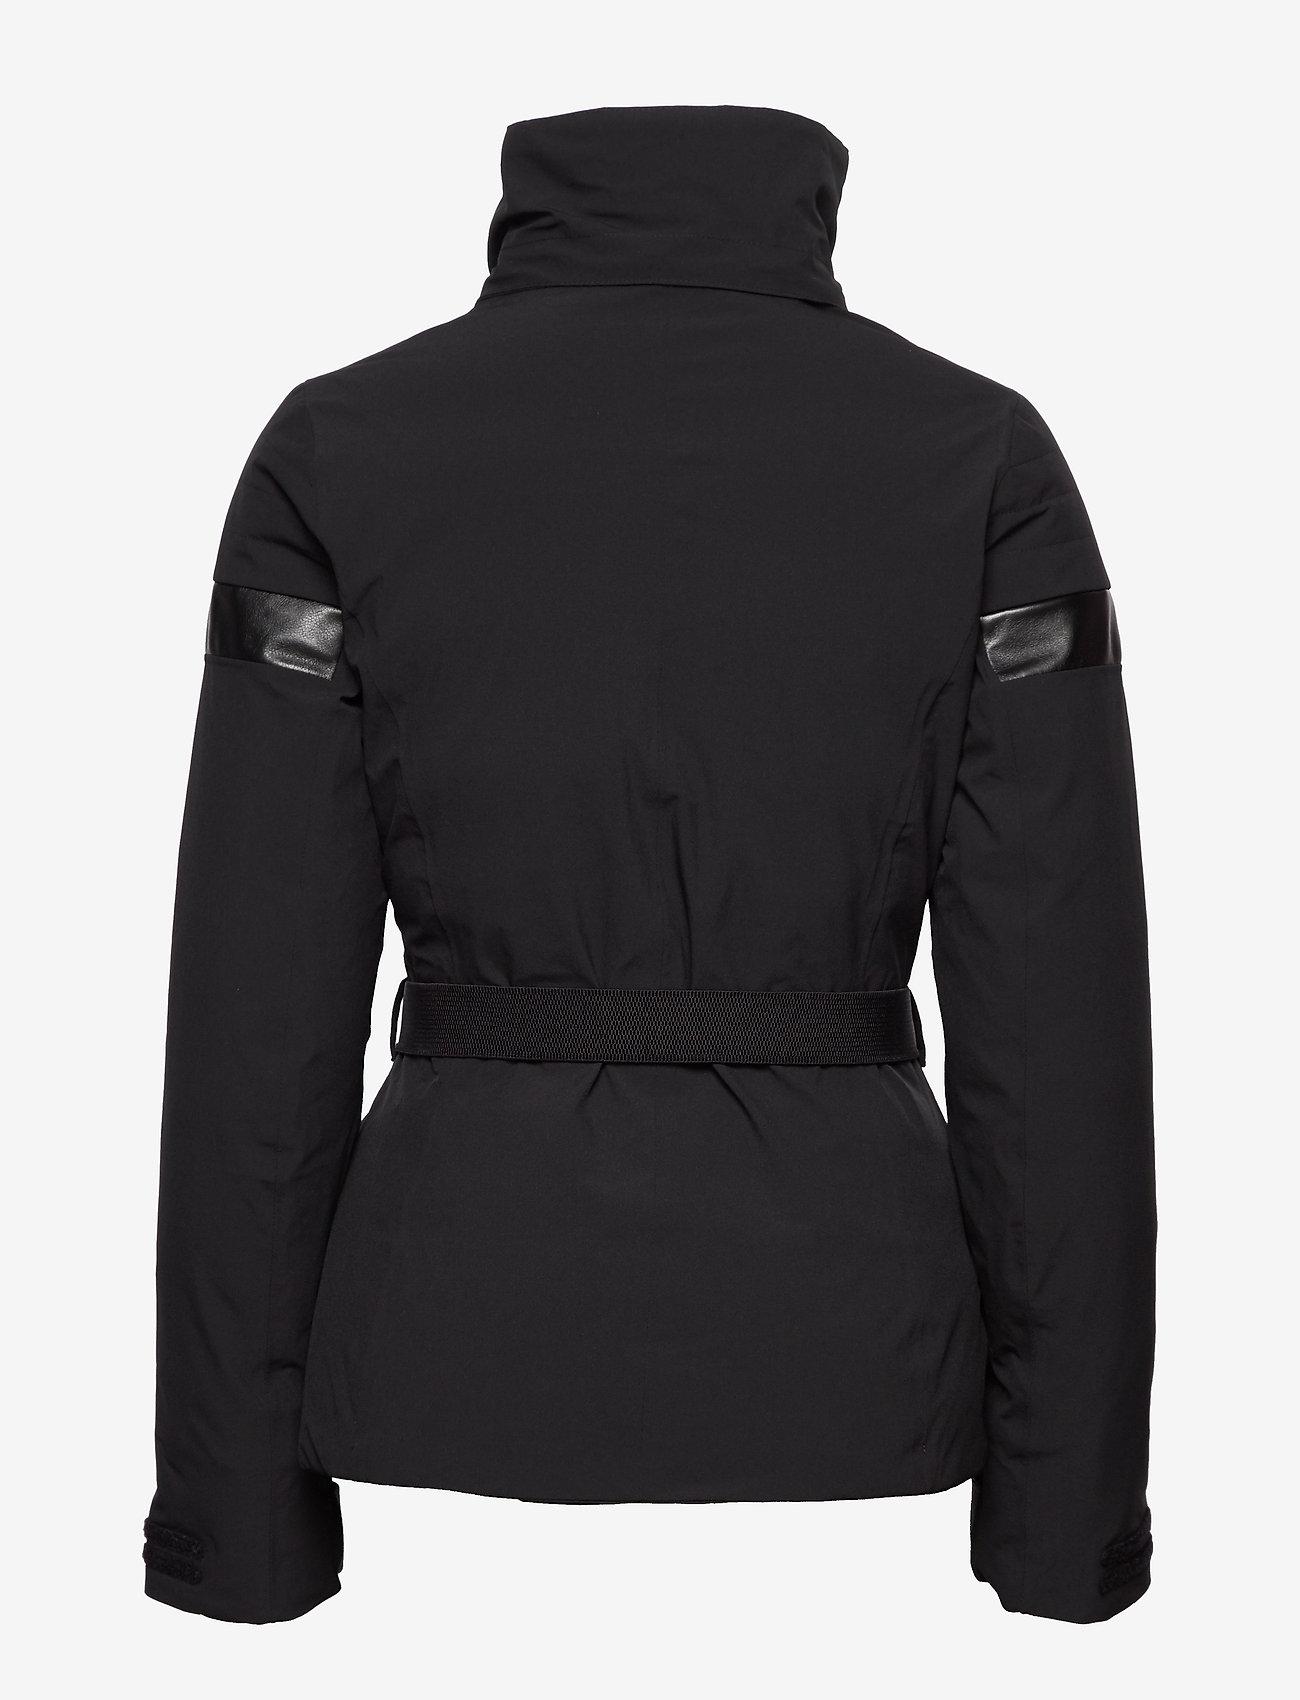 8848 Altitude Wivi W Jacket - Jackor & Kappor Black